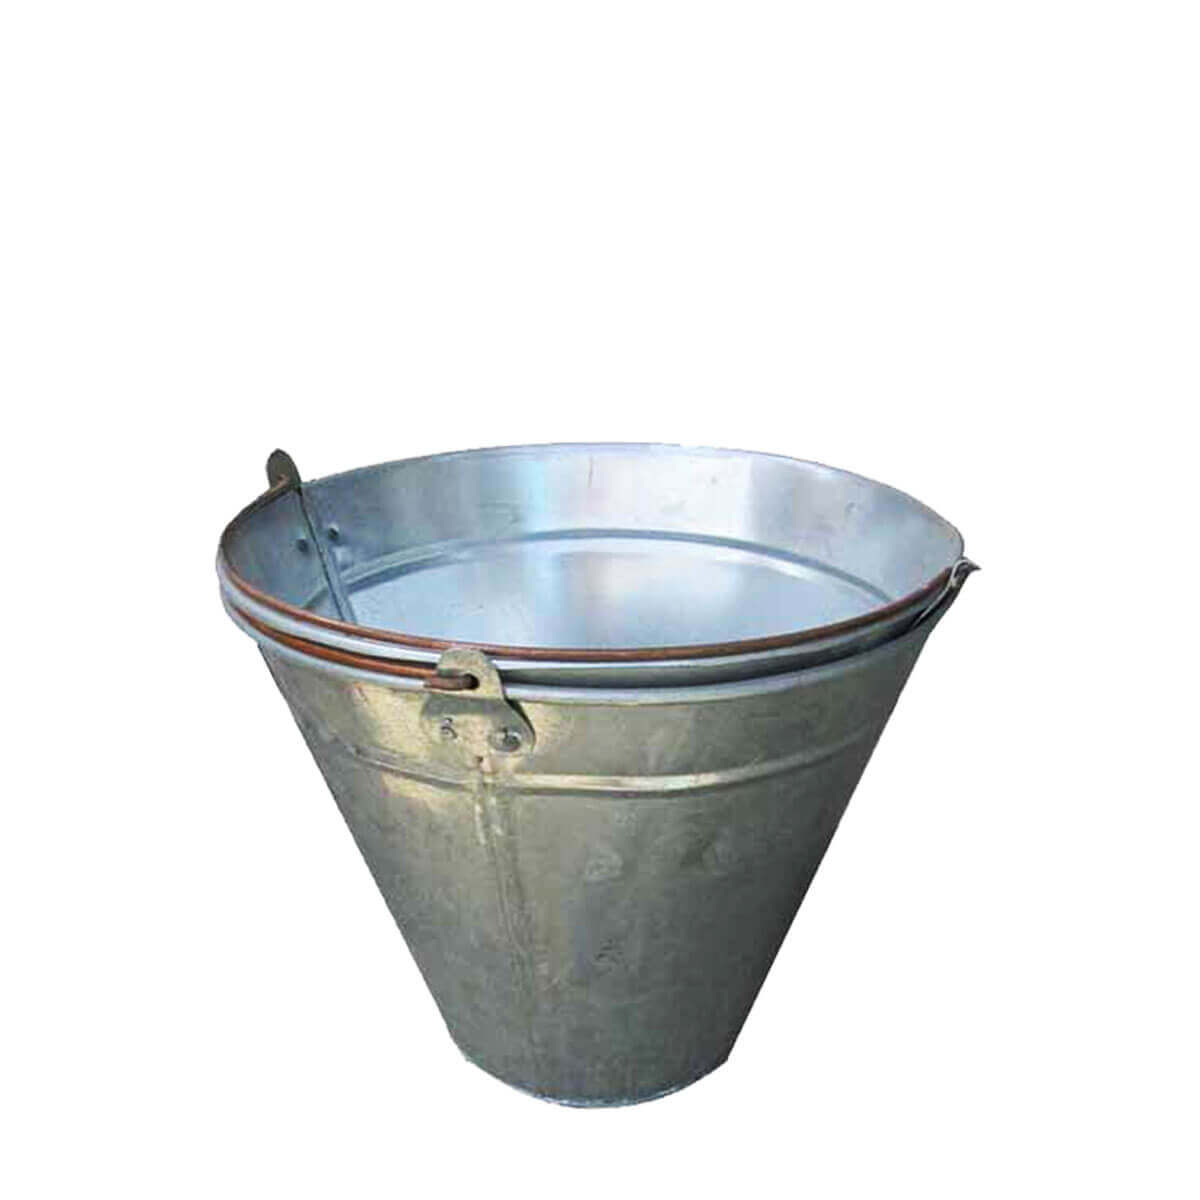 سطل بنایی گالوانیزه